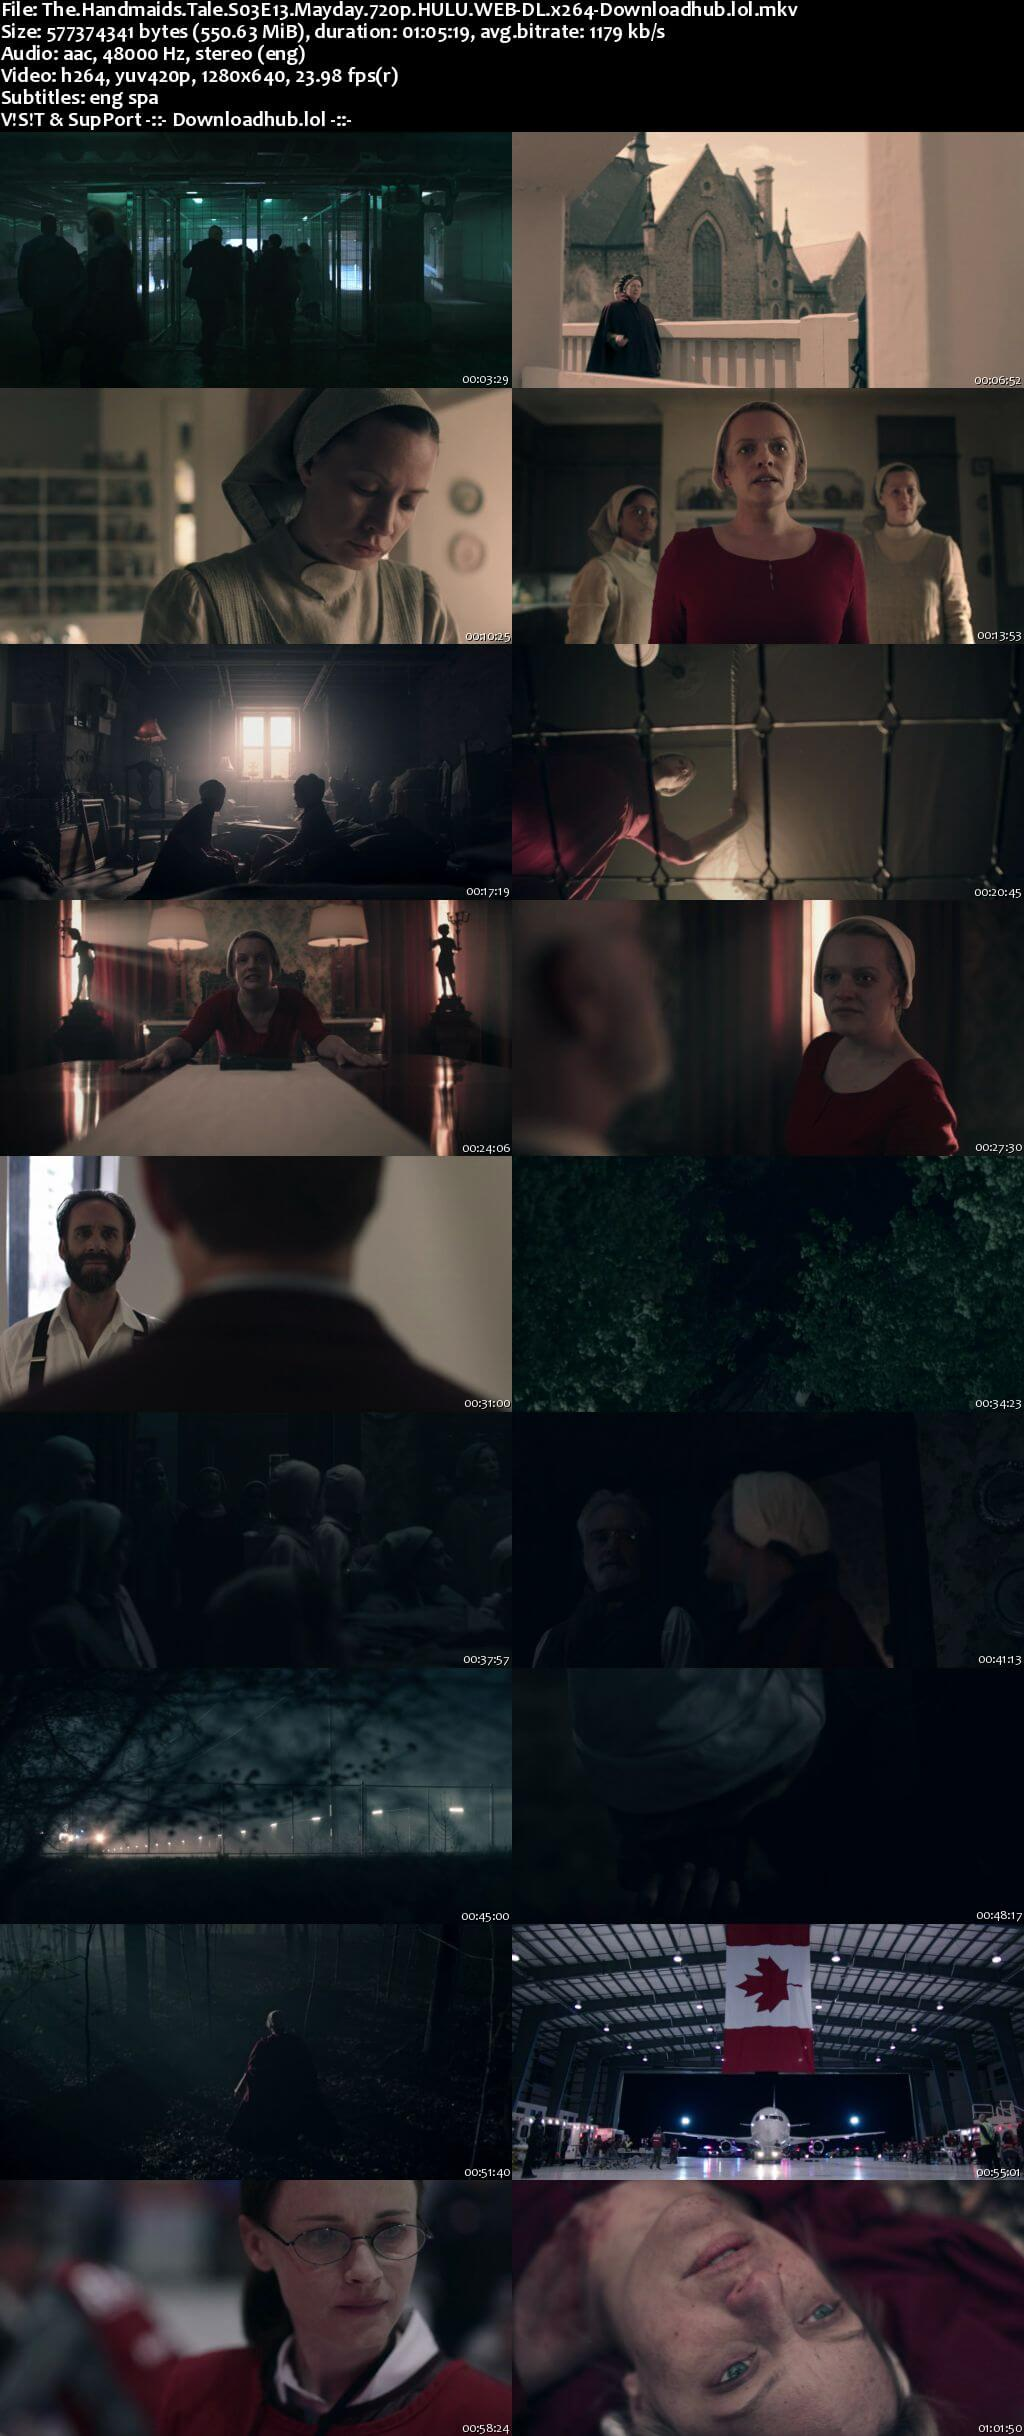 The Handmaids Tale S03E13 550MB WEB-DL 720p ESubs